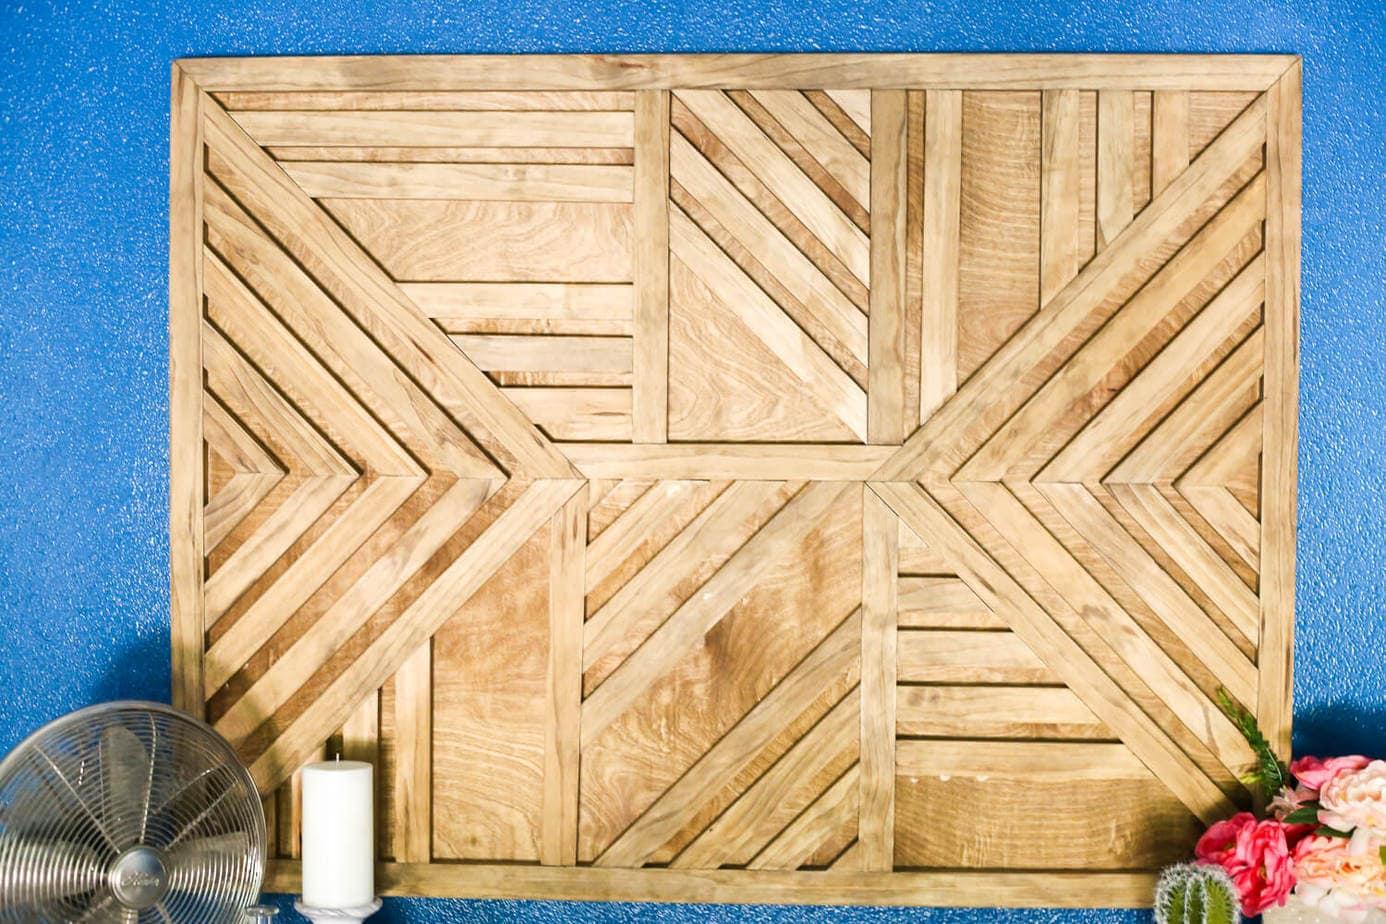 Outstanding Diy Wood Wall Art How To Make Your Love Renovations Wood Wall Art Diy Vignette Art Wall Decor Wood Wall Art Photo Wood Wall Art Large art Wood Wall Art